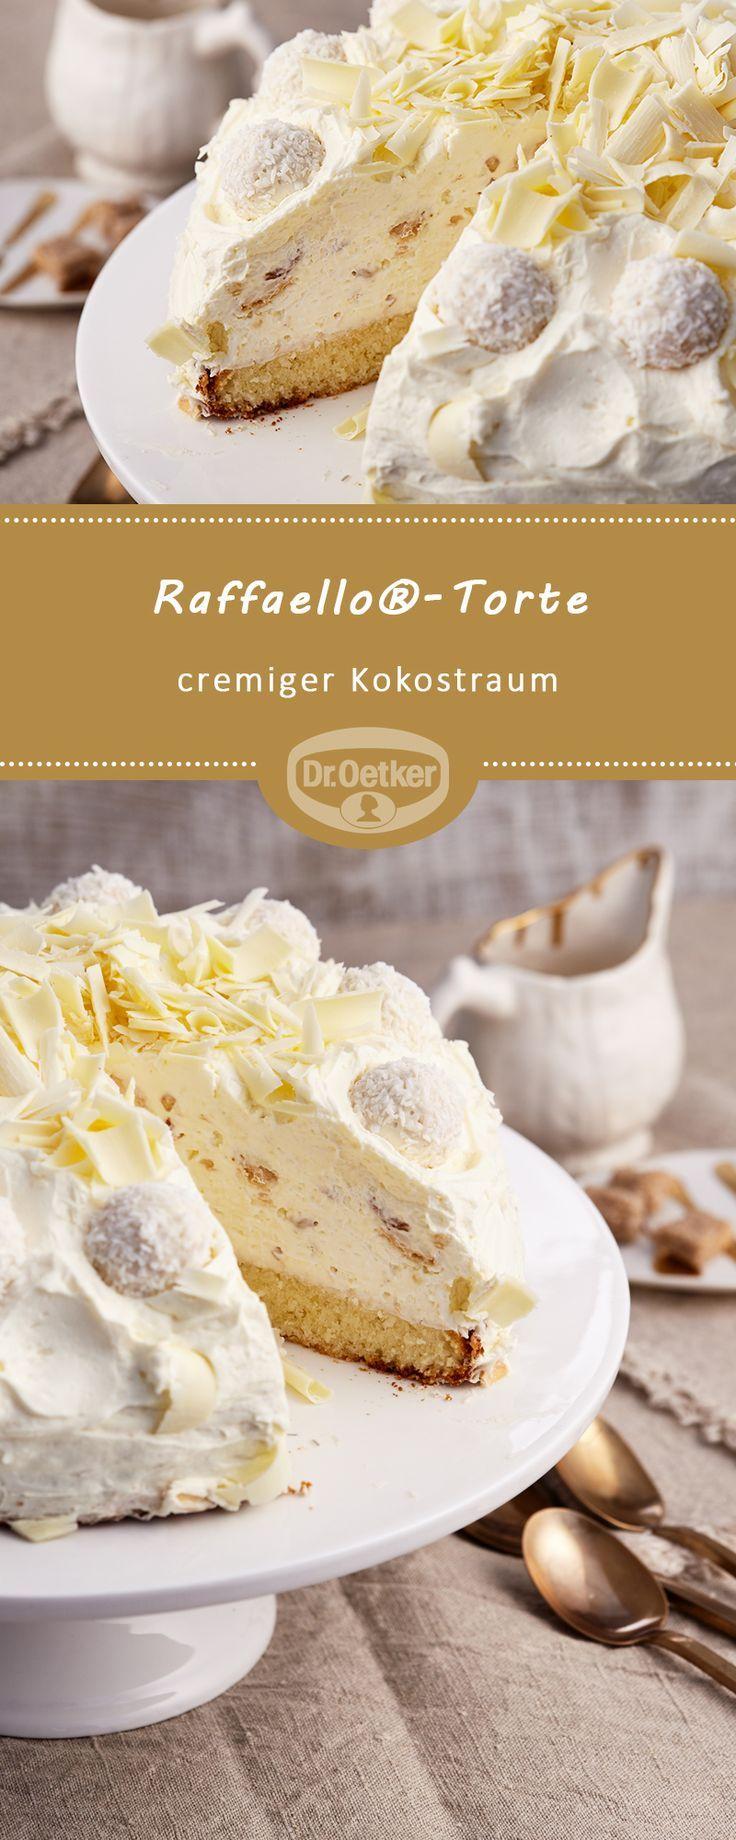 Raffaello®-Torte